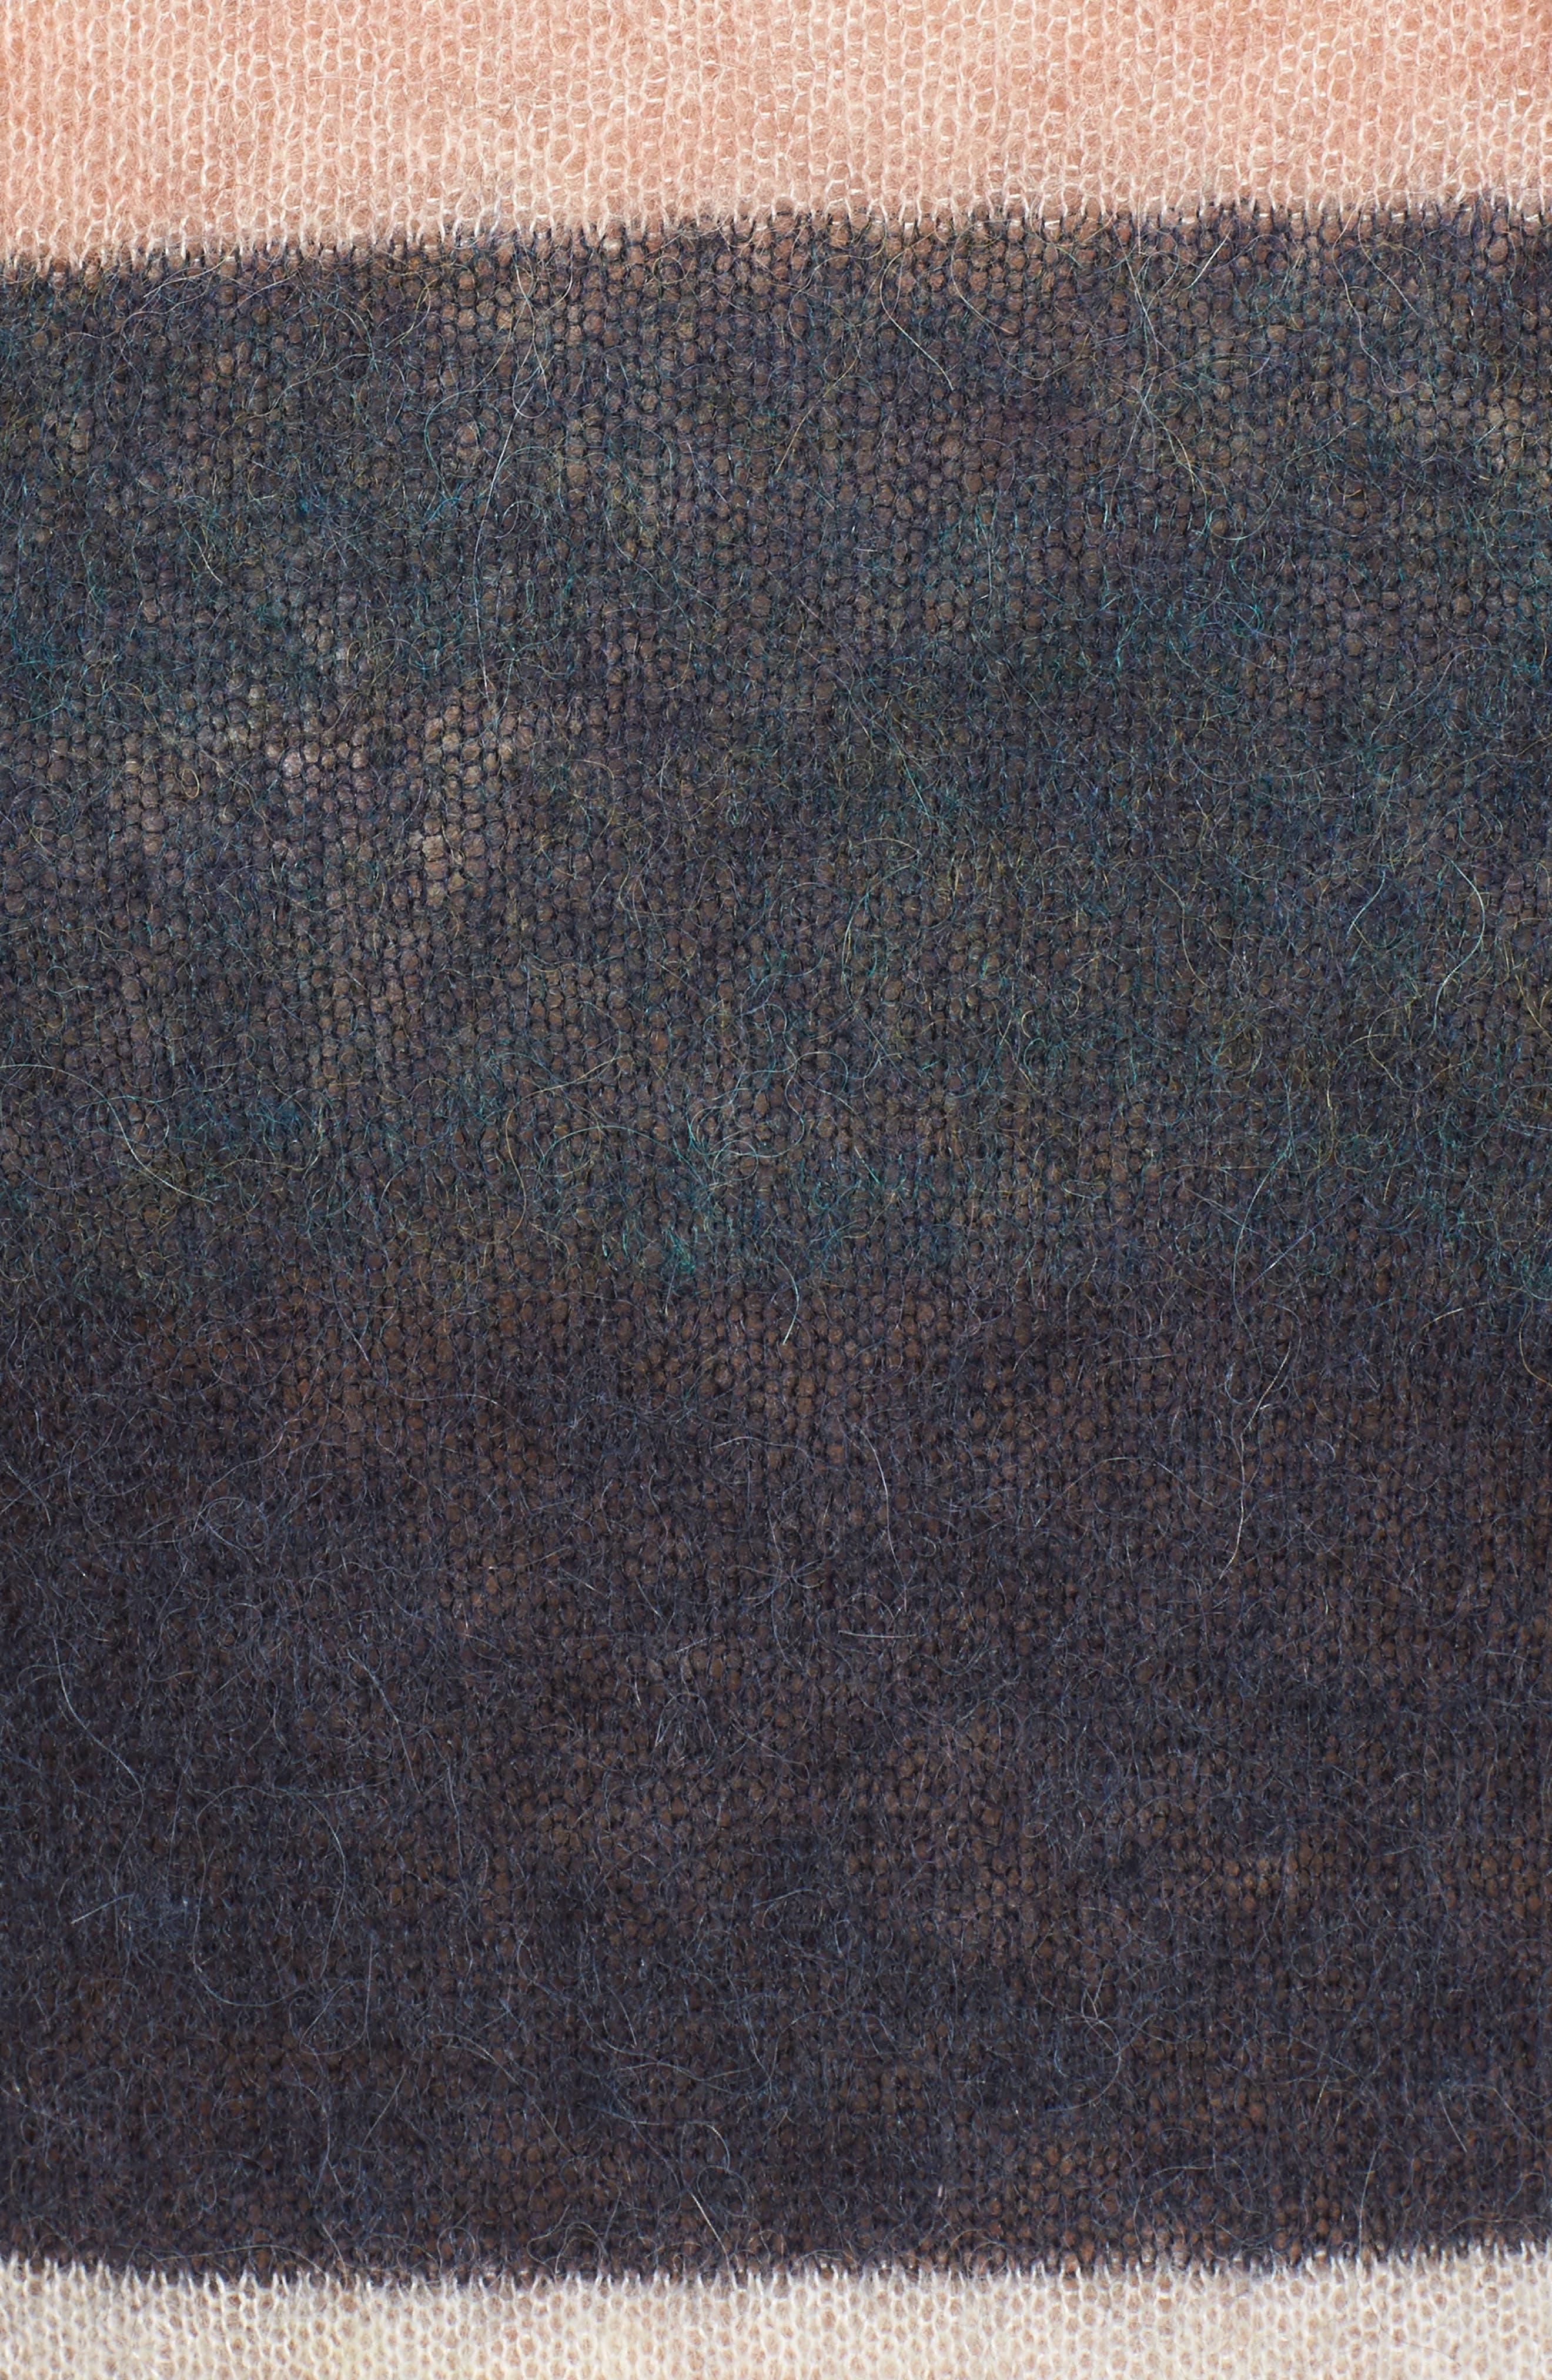 Stripe Alpaca Blend Sweater,                             Alternate thumbnail 5, color,                             Fall Multi Stripe